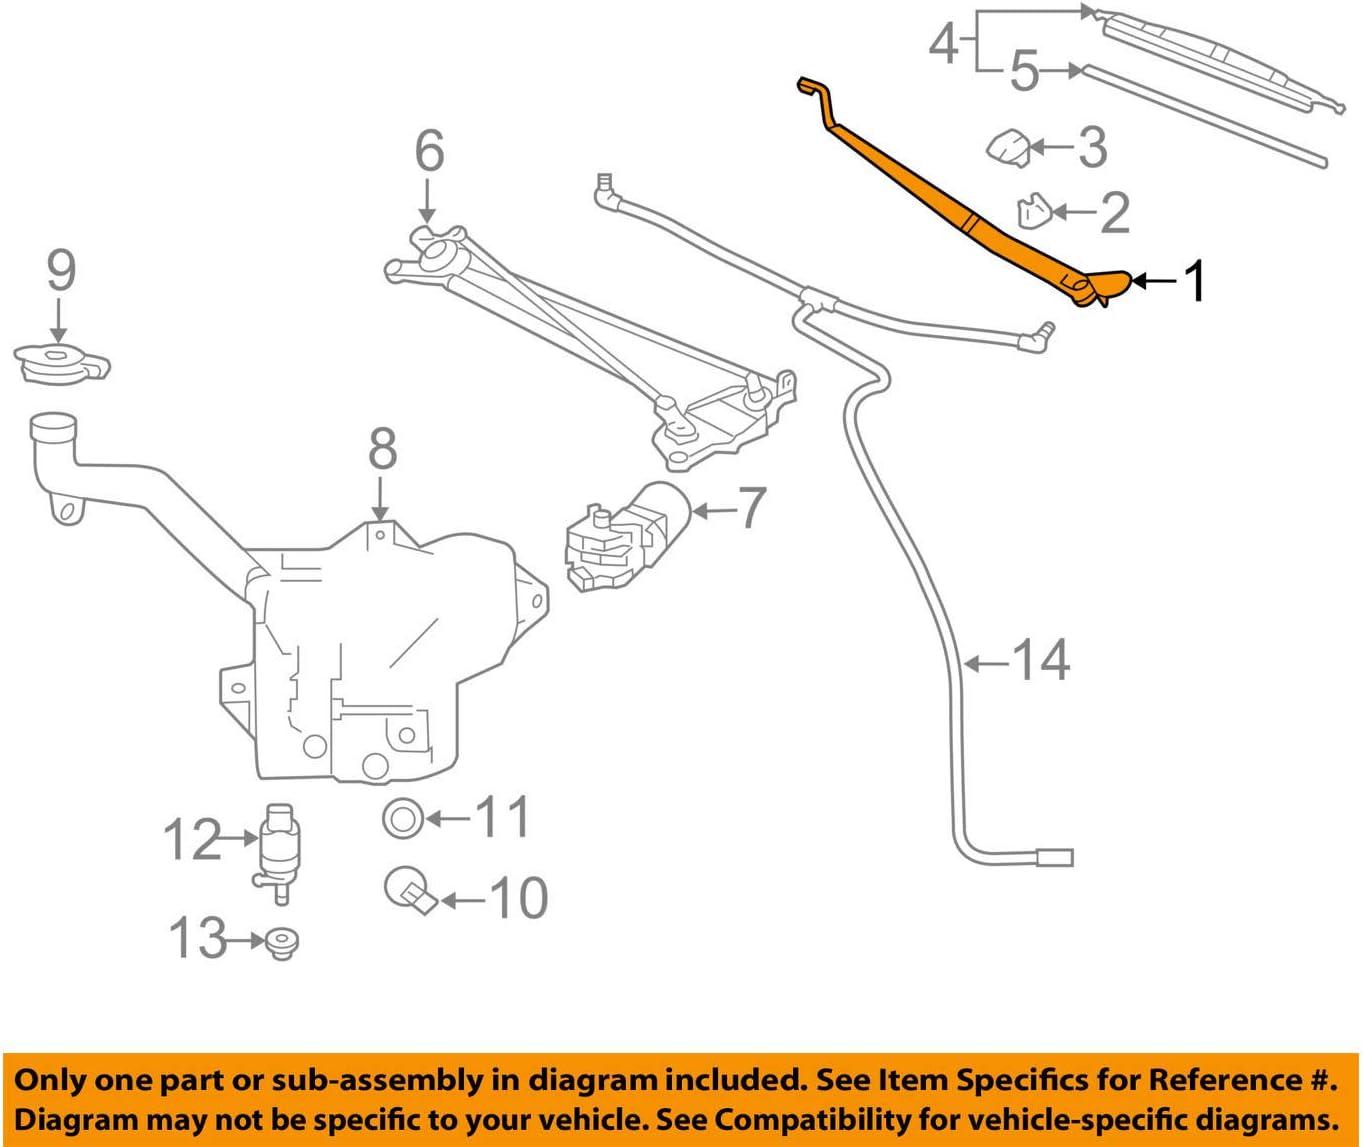 Super Special SALE held General Motors 22756329 Spasm price Arm Wiper Windshield